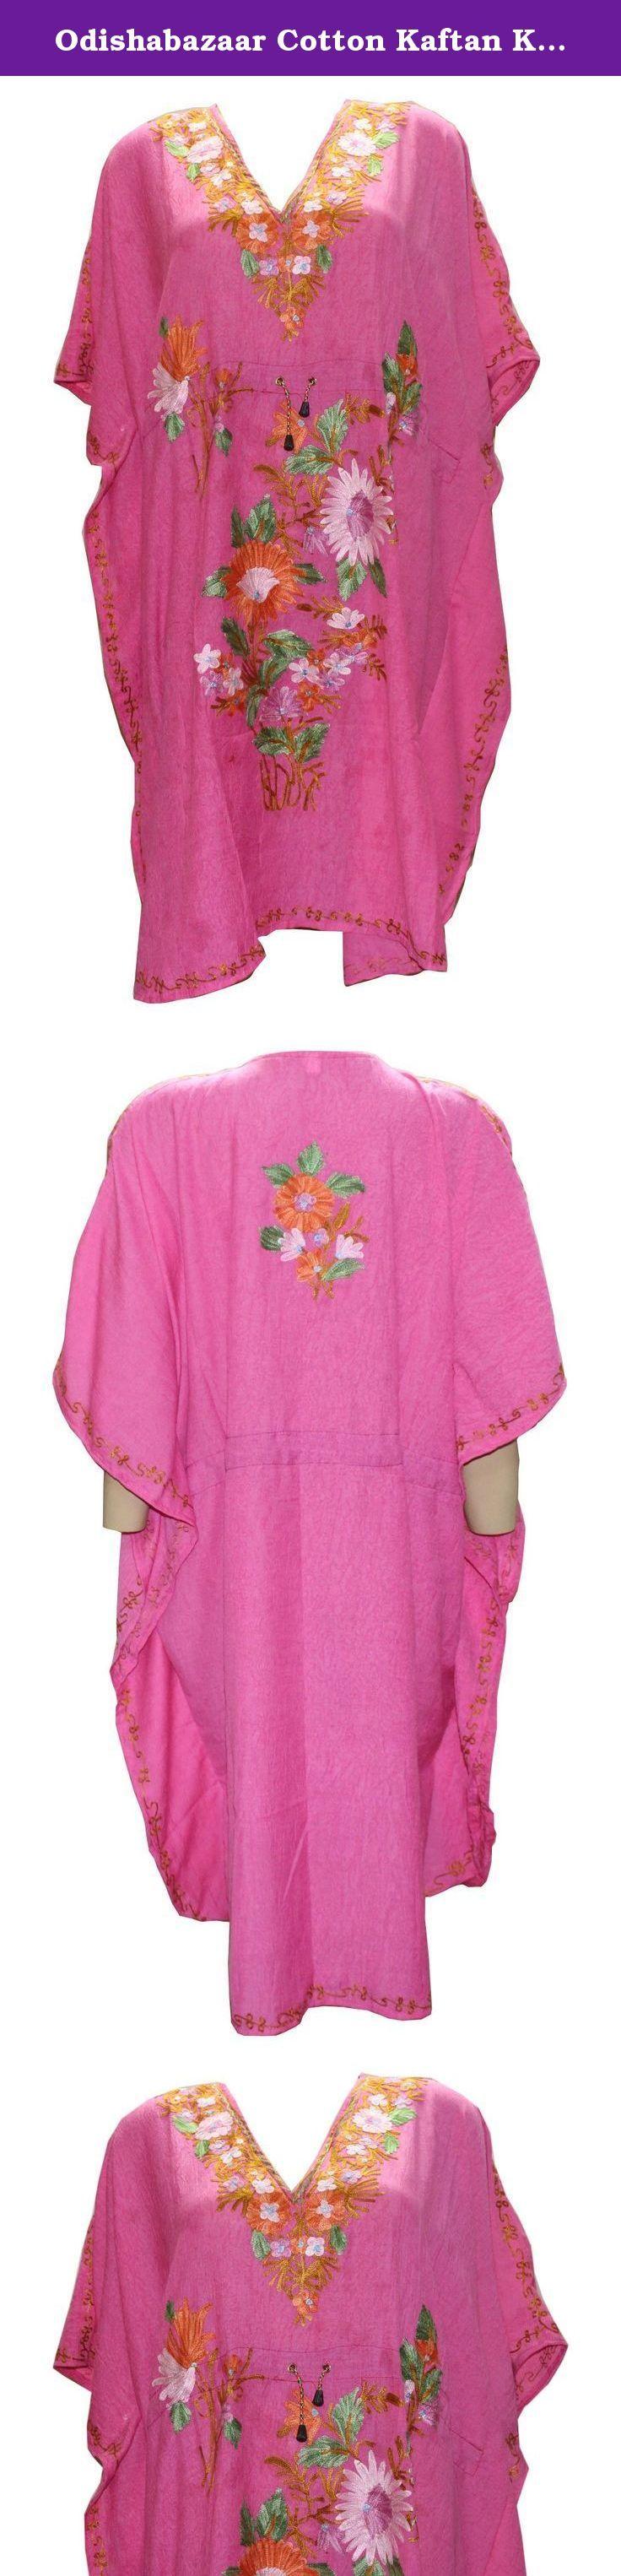 Odishabazaar Cotton Kaftan Kashmiri Embroidered Short Length Dress for Women (multi-3). Short length Kashmiri Kaftan/lounge wear/beach wear/ Sort dress with Ari Embroidered Flowers.